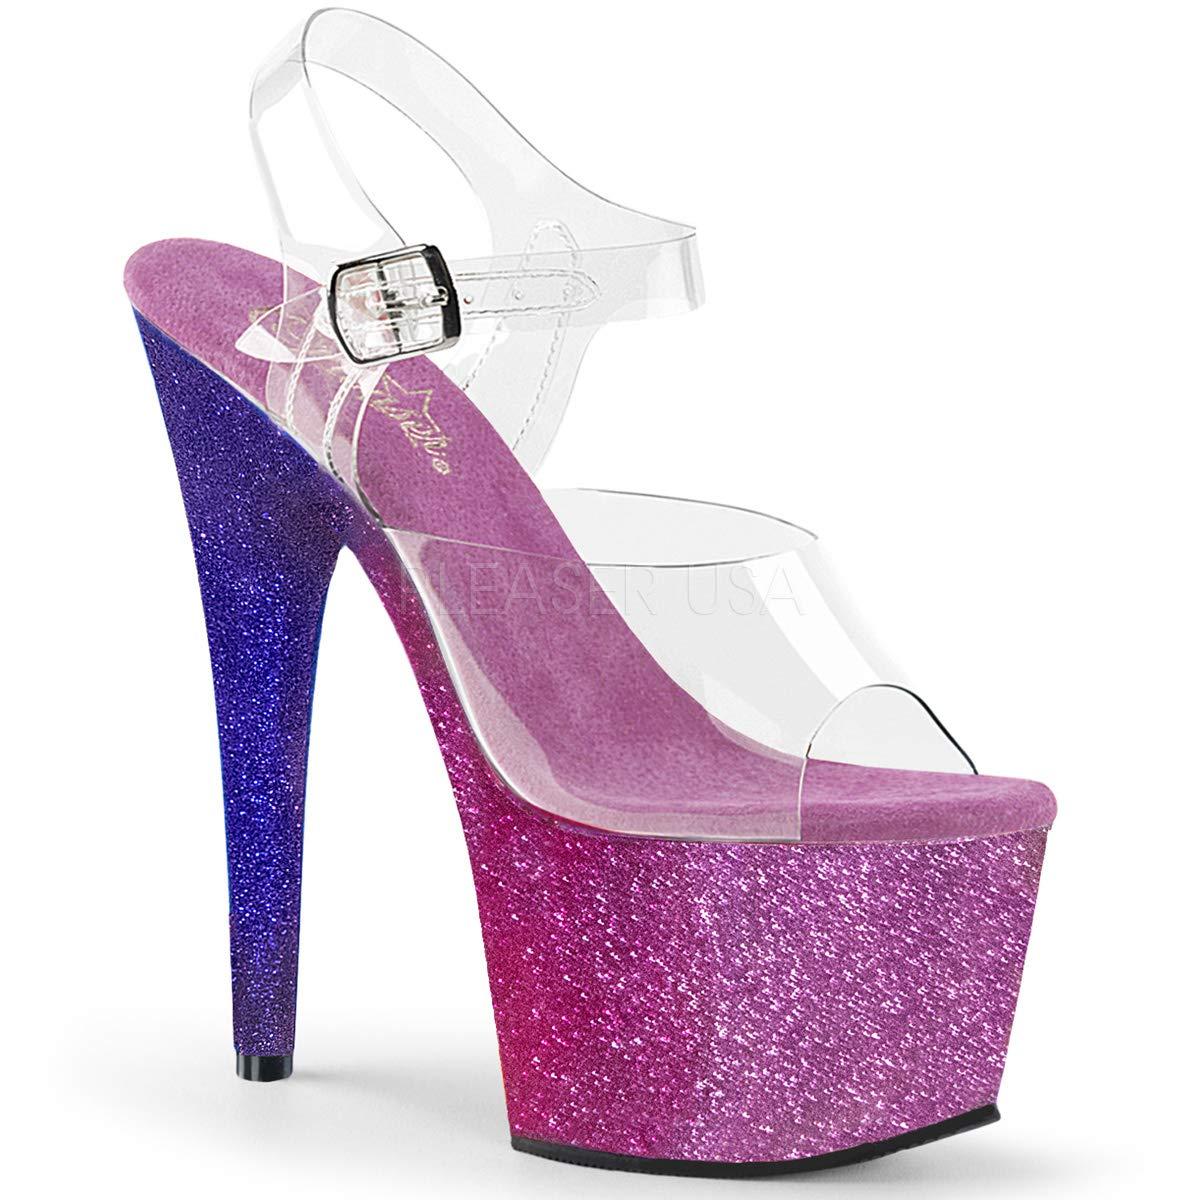 Women's Adore Clear Open Toe Top Sparkling Fuchsia Ombre Platform Sandals - DeluxeAdultCostumes.com